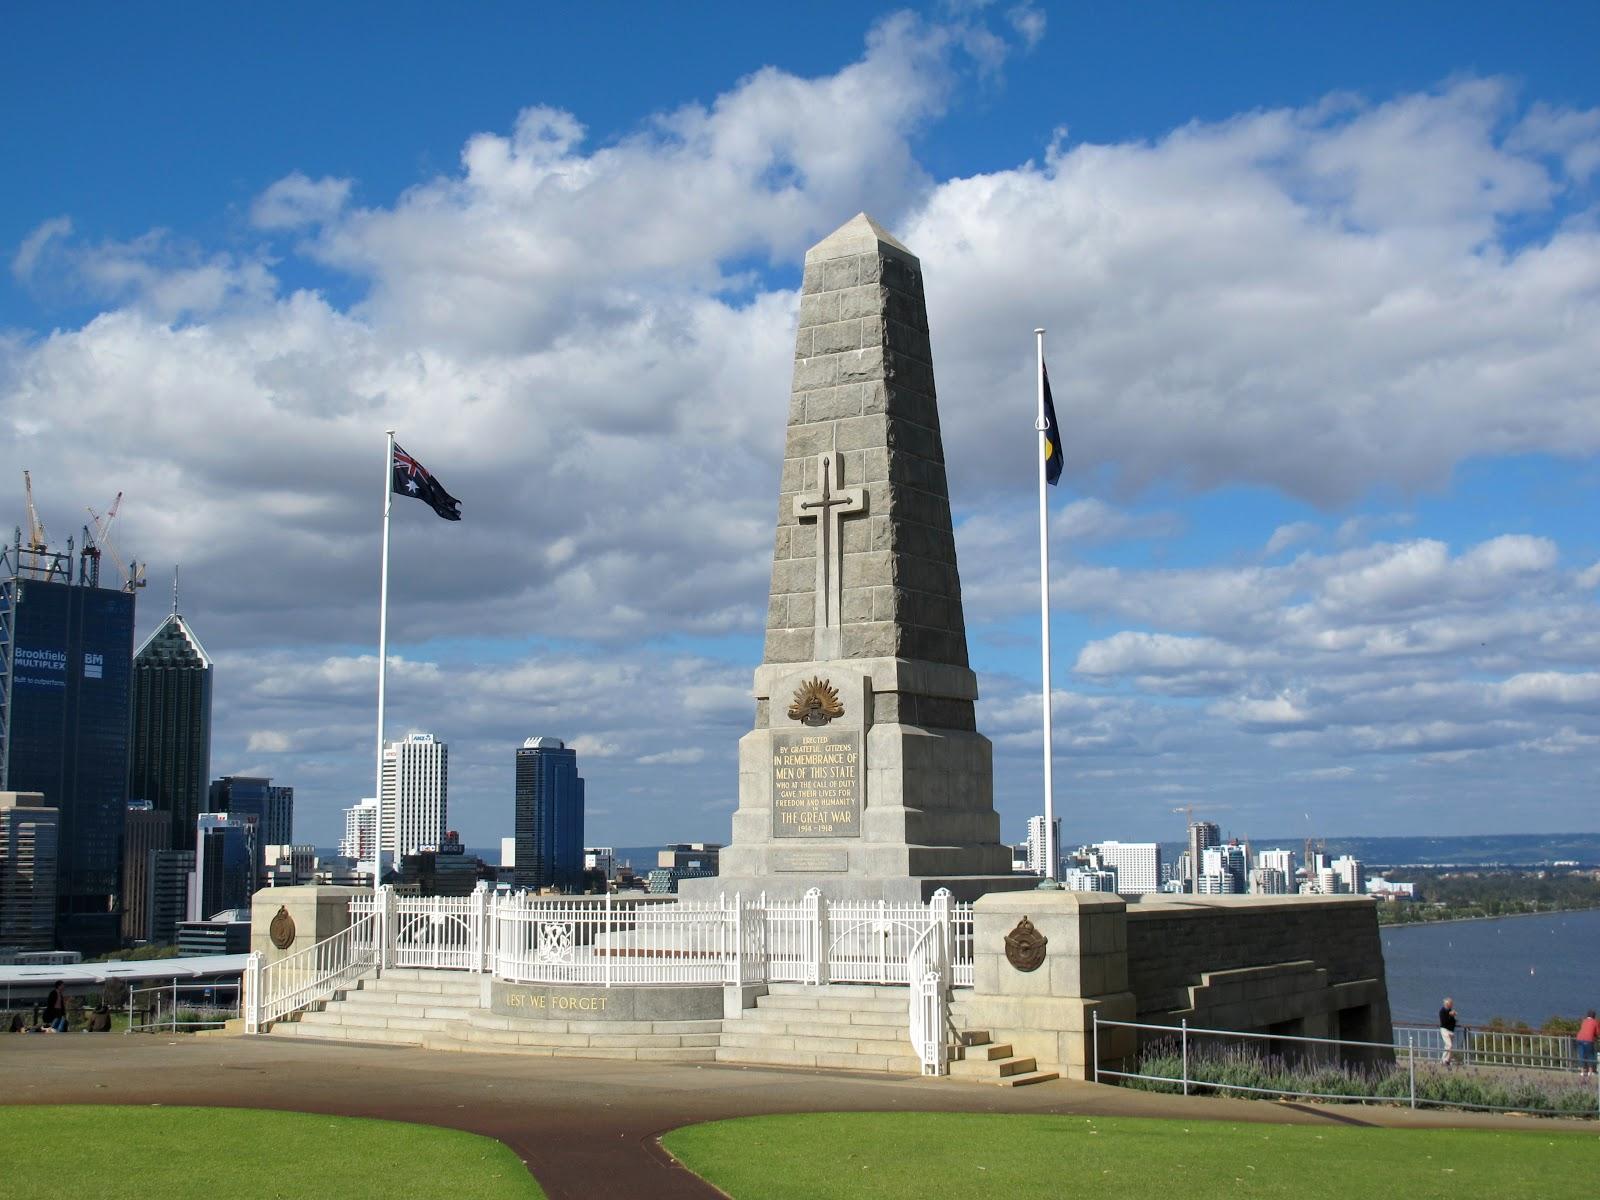 Updating status in Perth